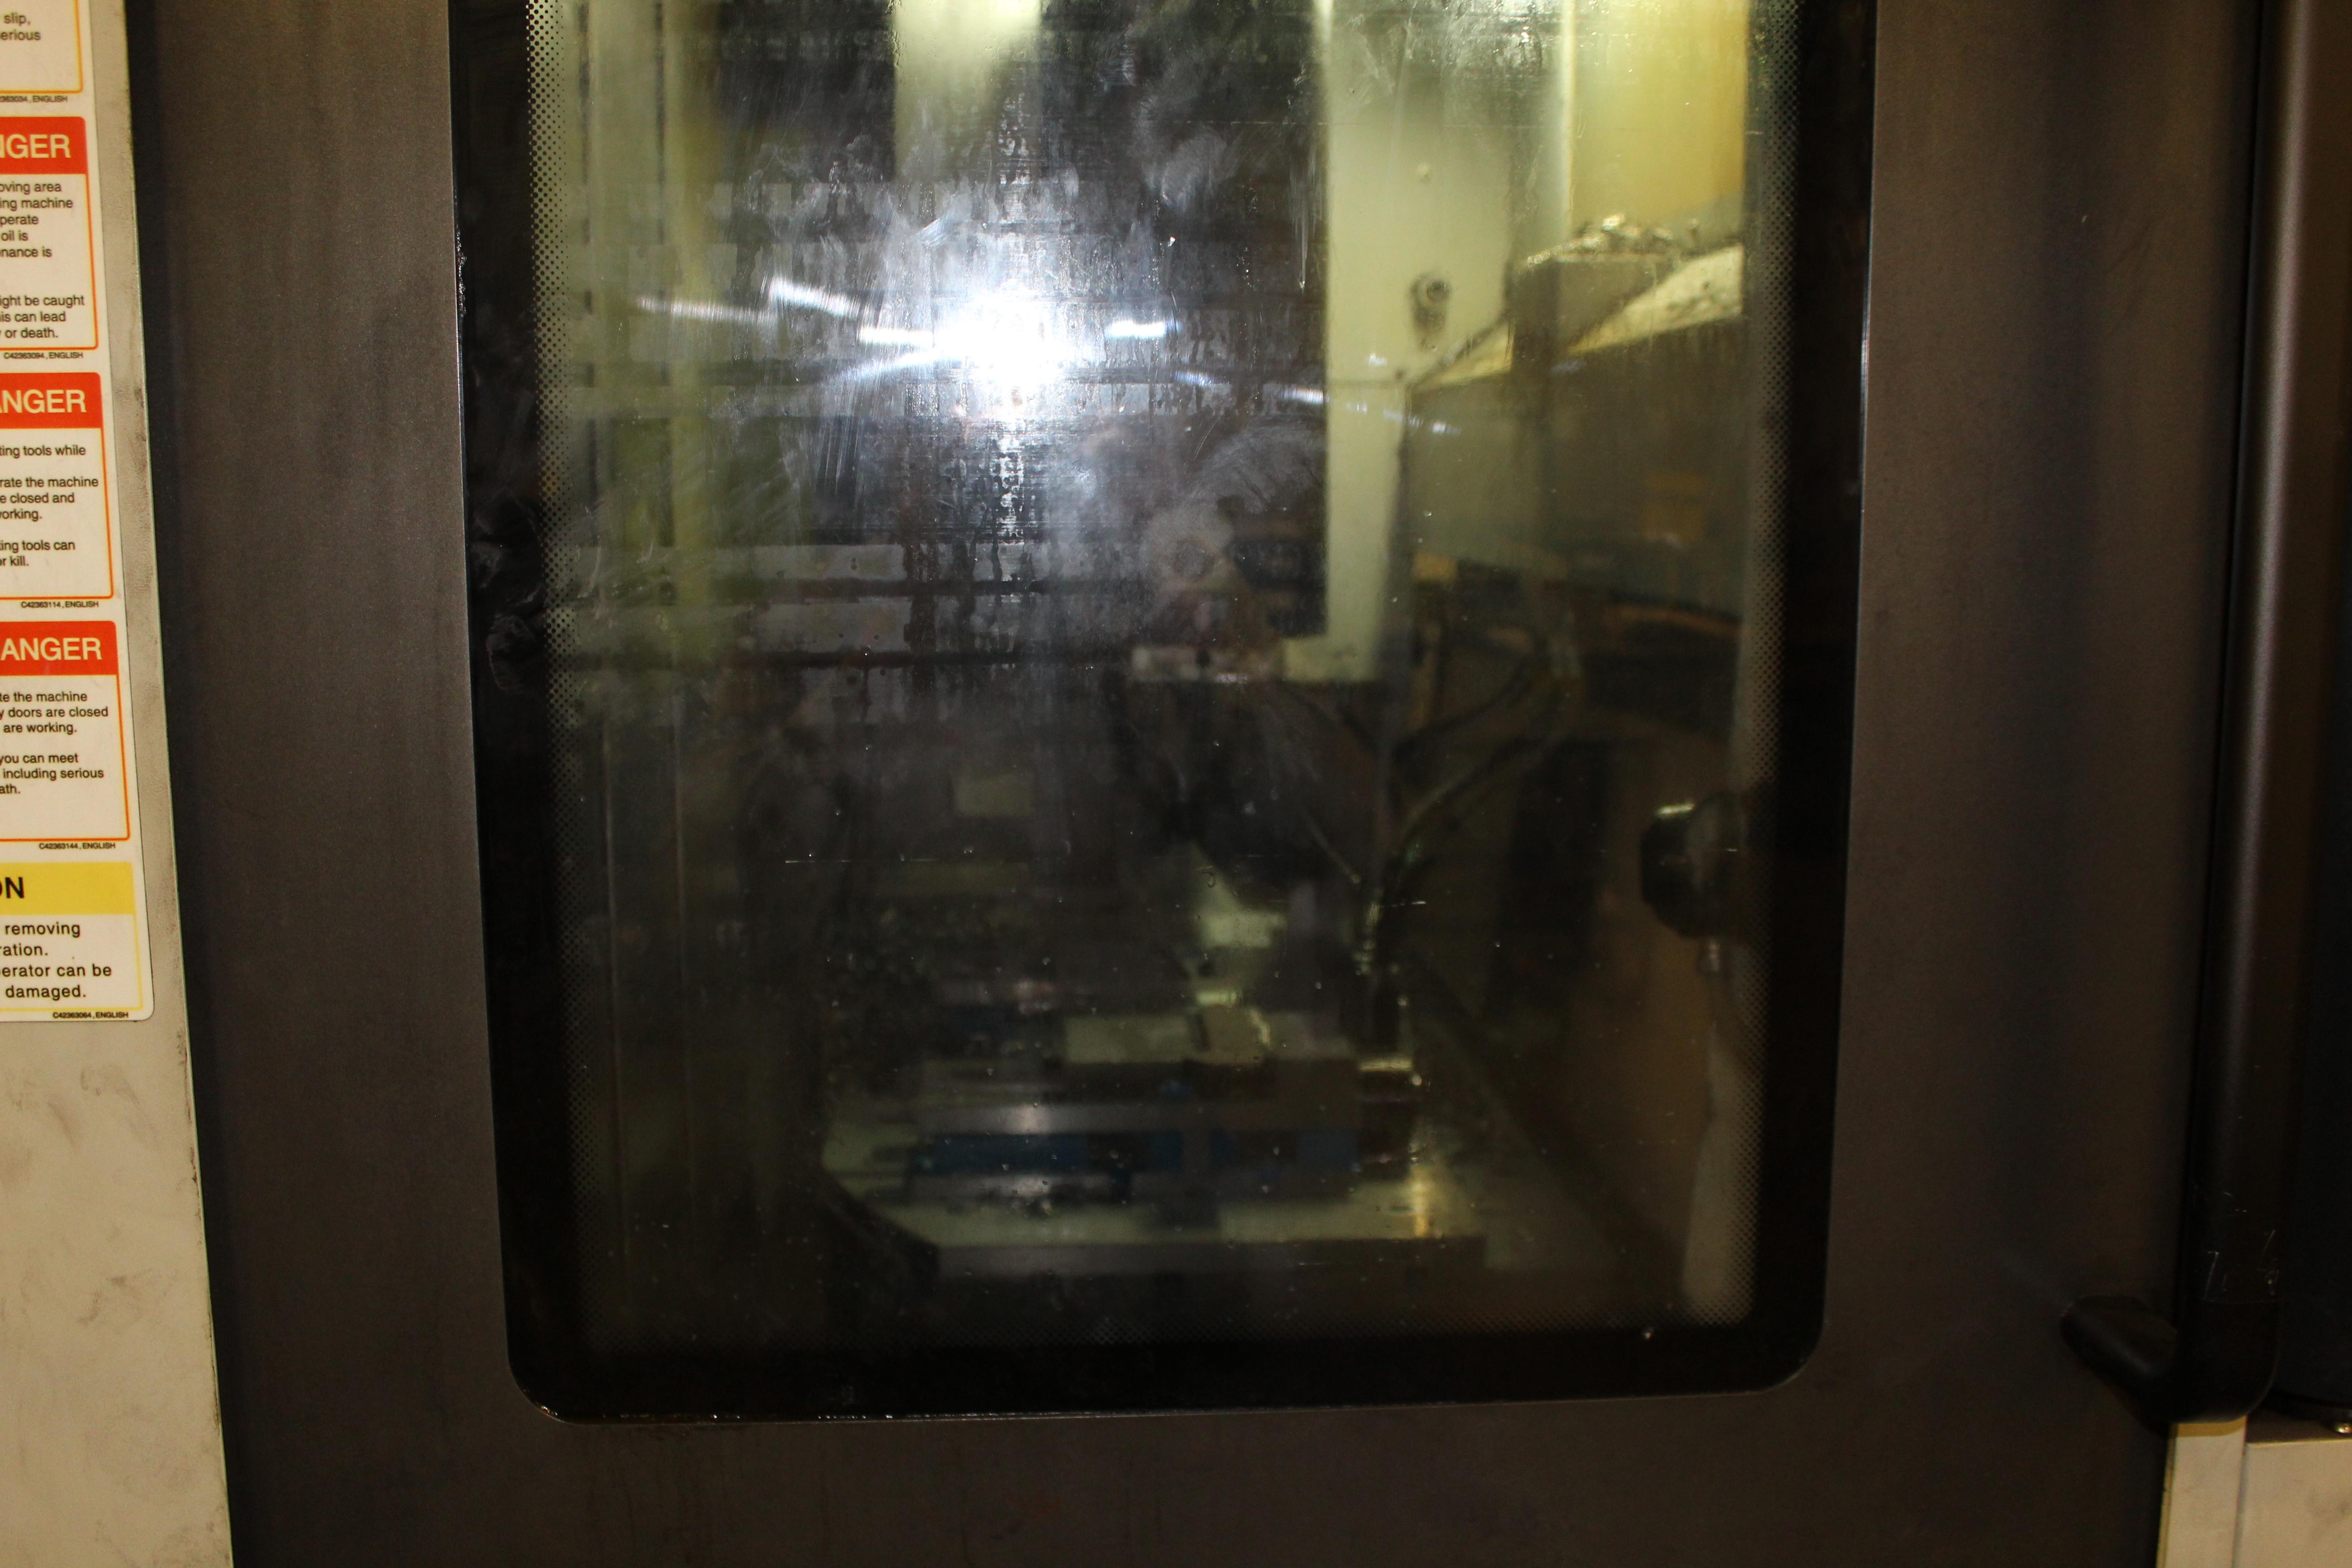 Doosan Model VC-500 VMC (2011), Fanuc 32iA, 20 HP, 10,000 RPM, 30 ATC, Chip Conv, 11,500 Approx Hrs - Image 8 of 8